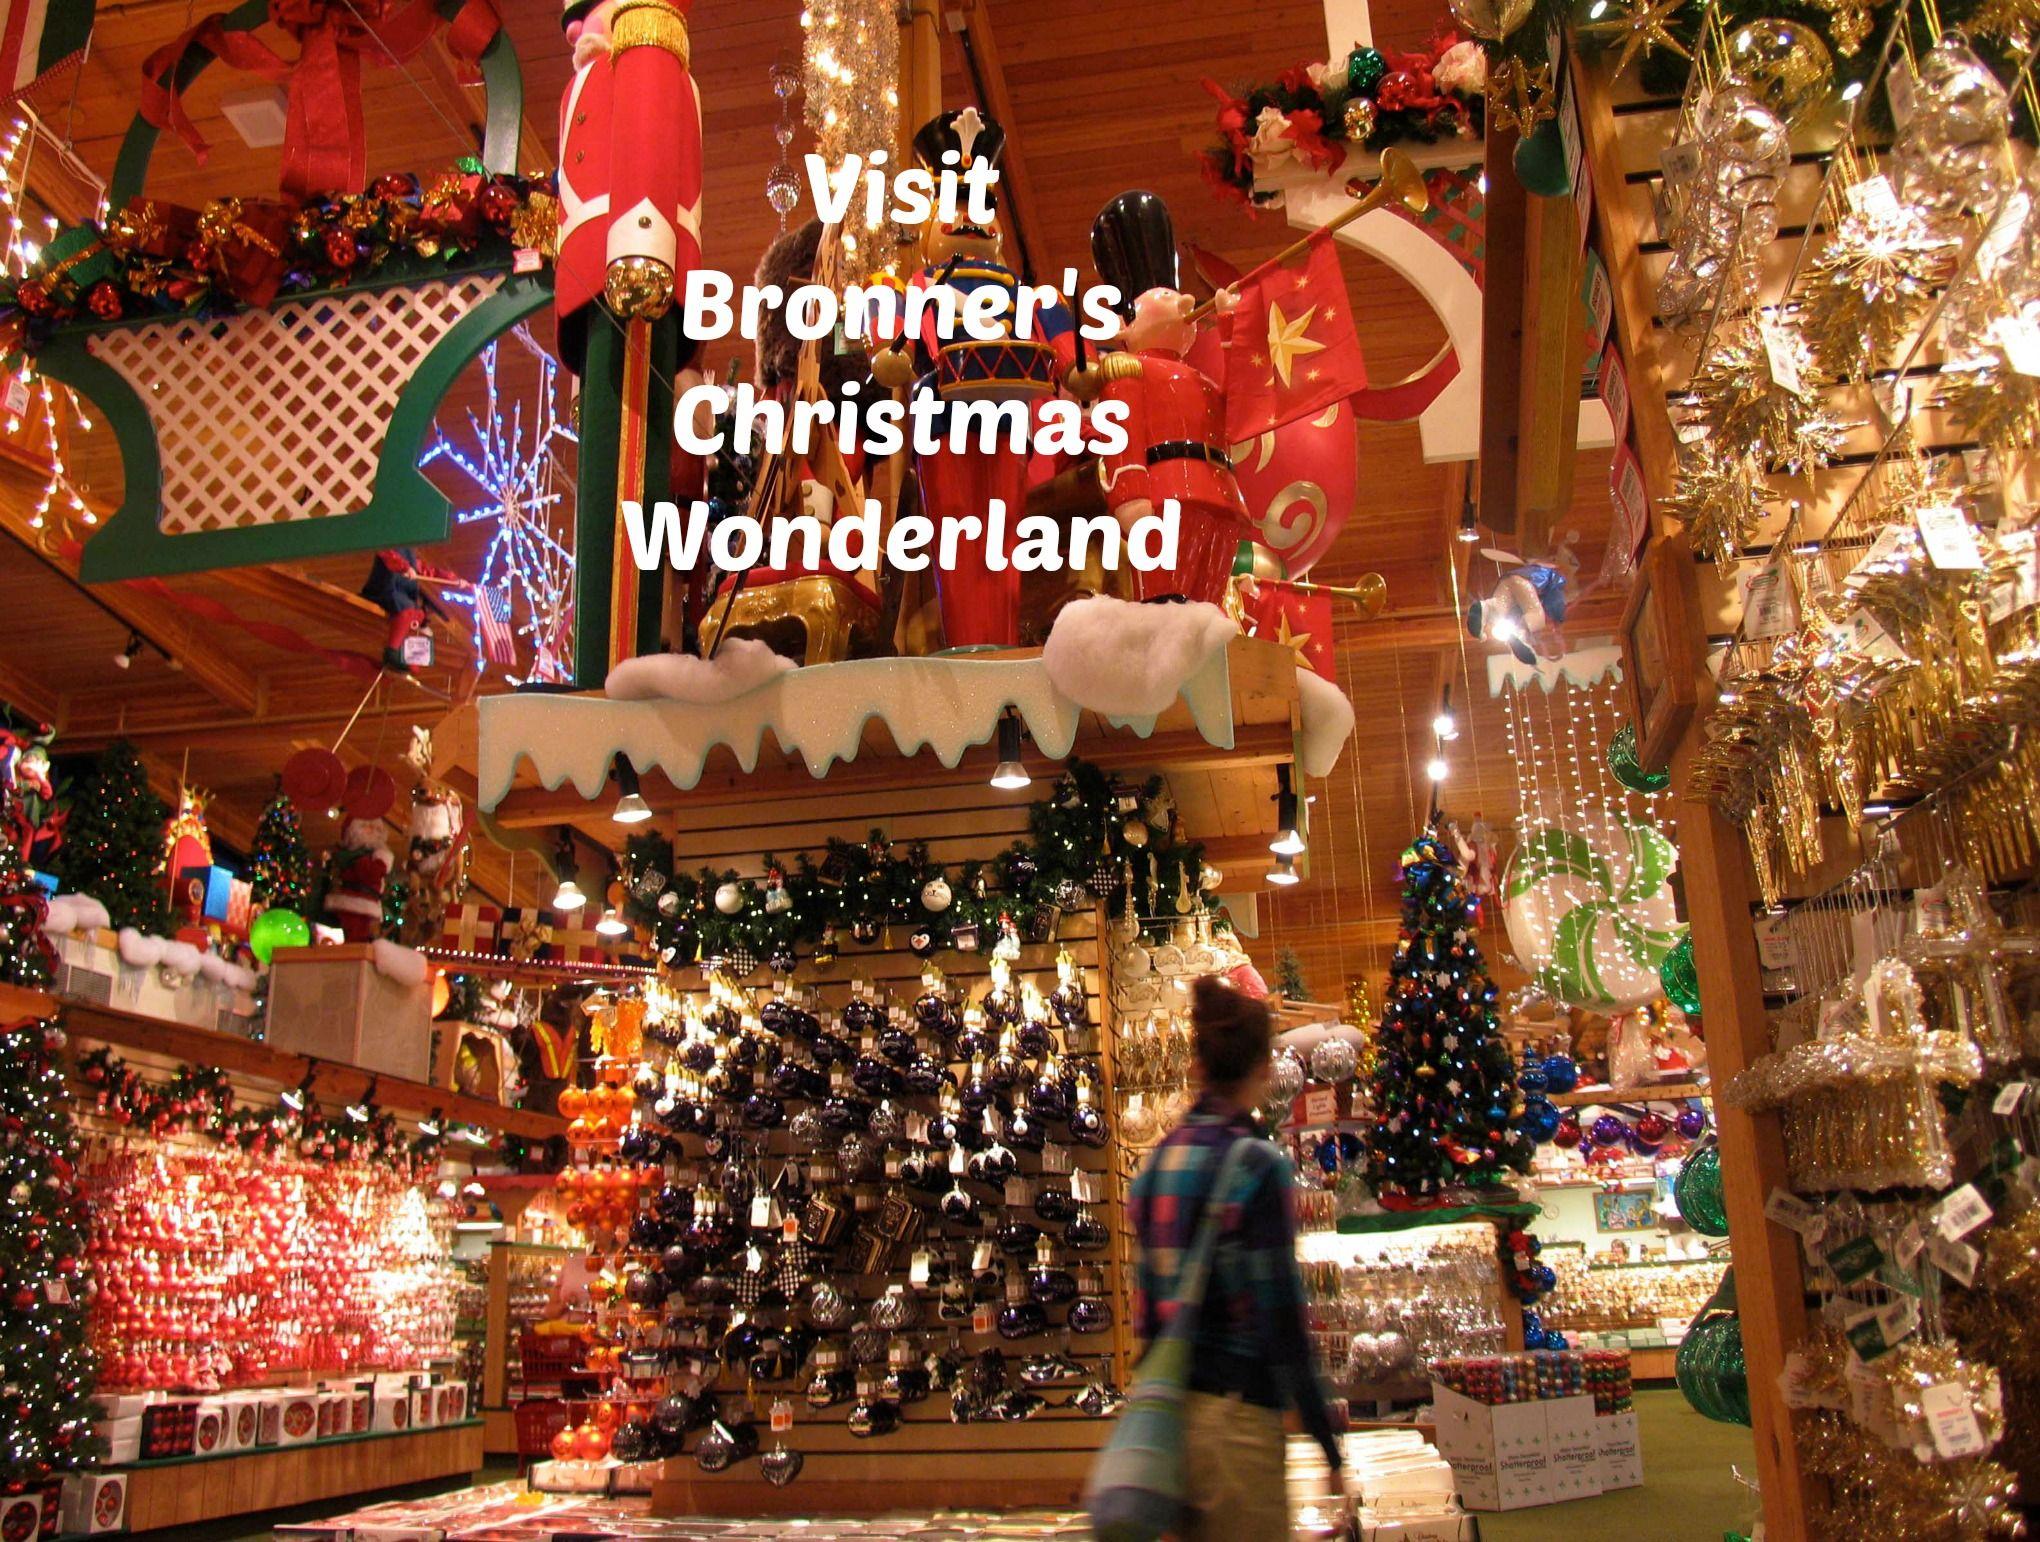 visit bronners christmas wonderland frankenmuth michigan jpg 2040x1542 bronners christmas store